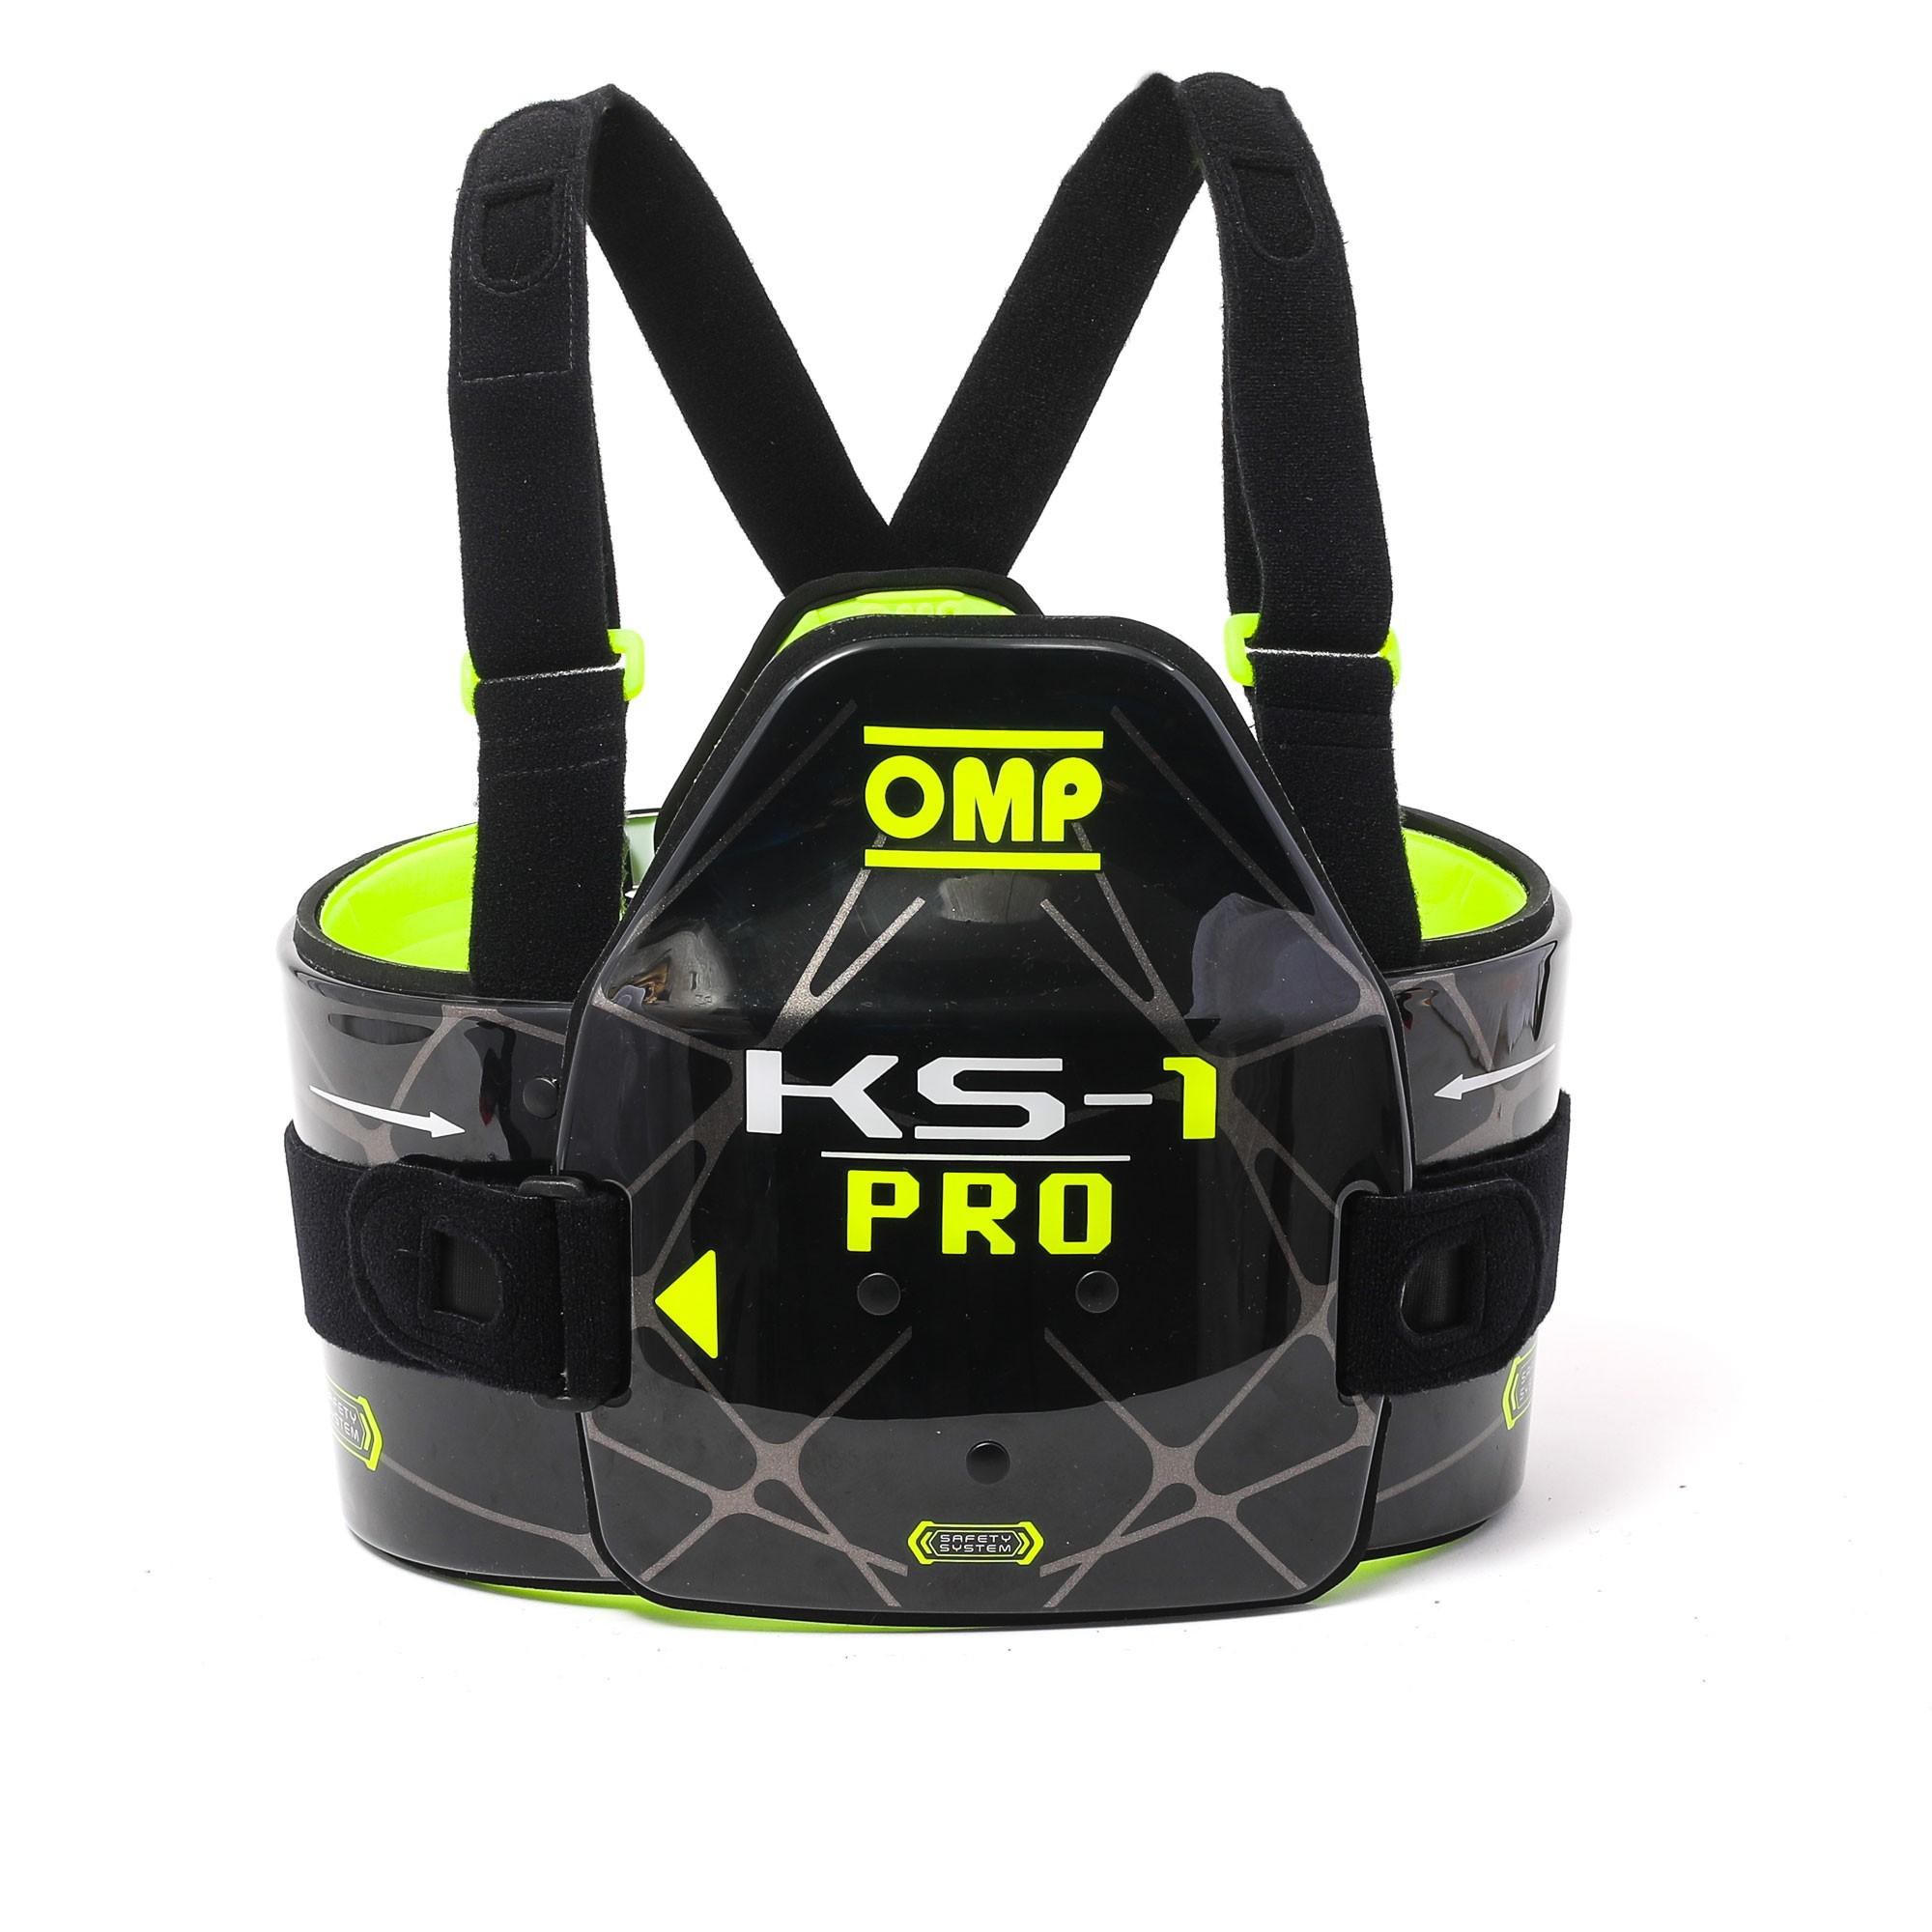 OMP KS-1 PRO BODY PROTECTION